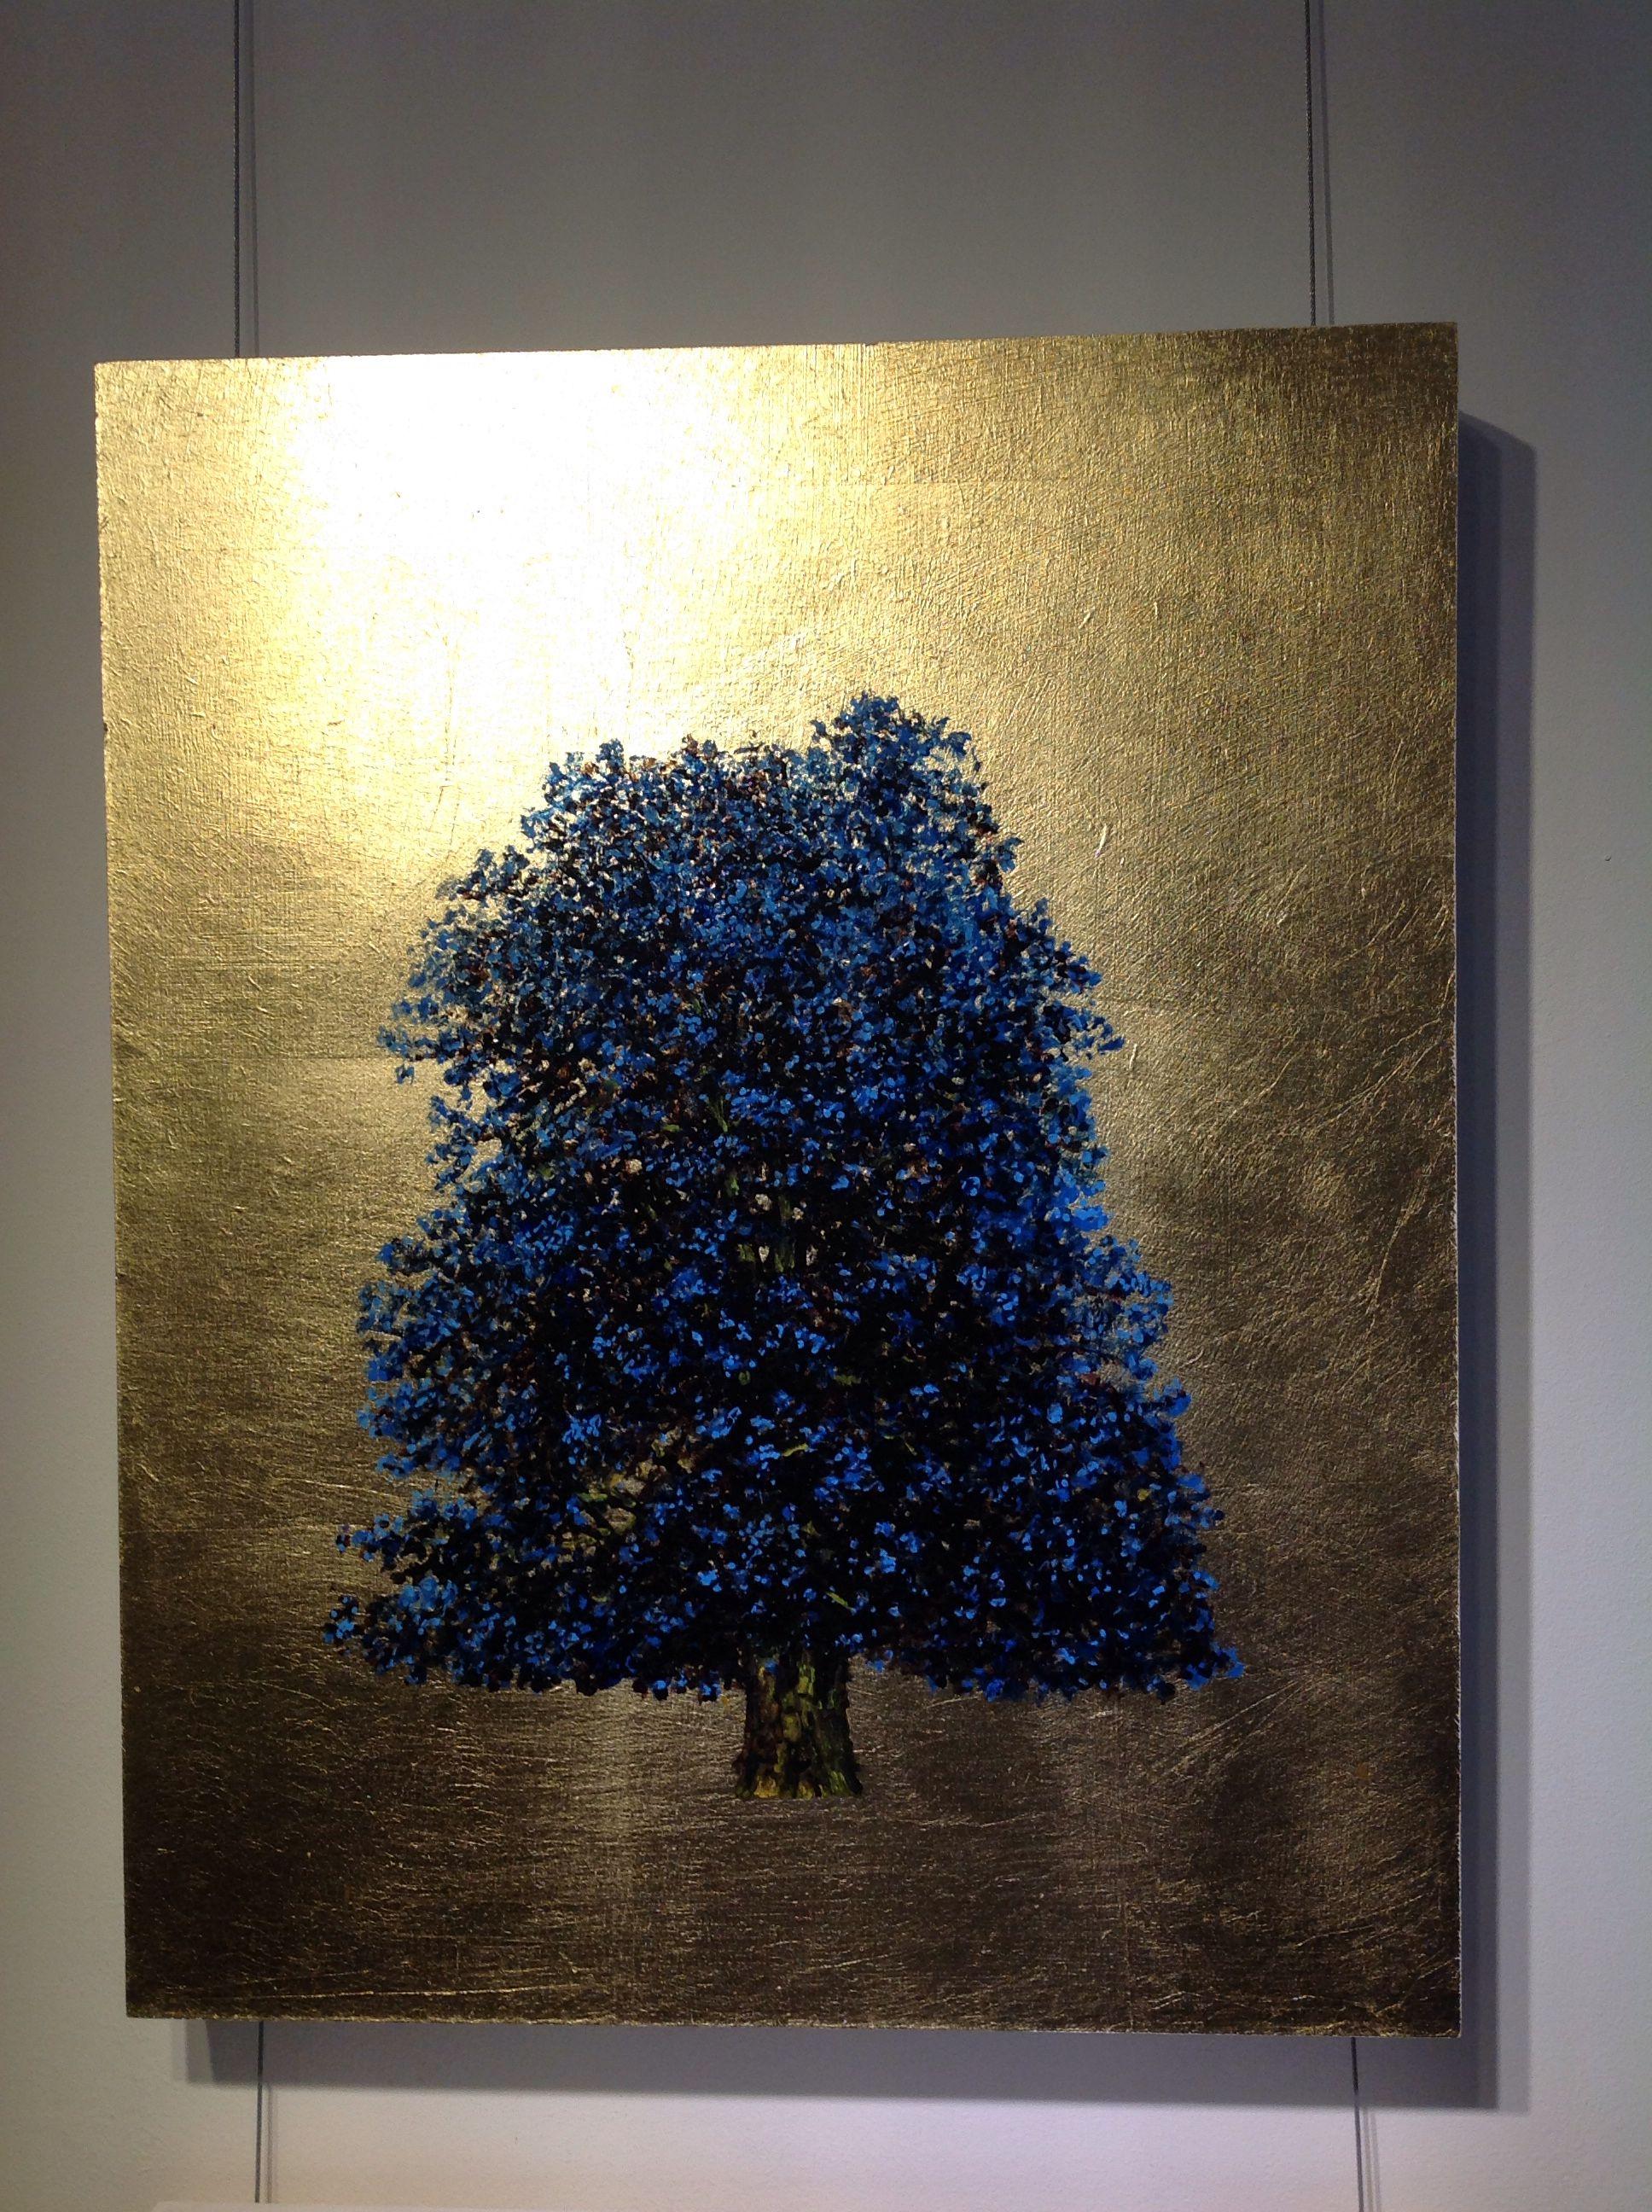 Blue On Gold #Oil #Painting #Nature #Contemporaryart #Goldleaf #Jackframe